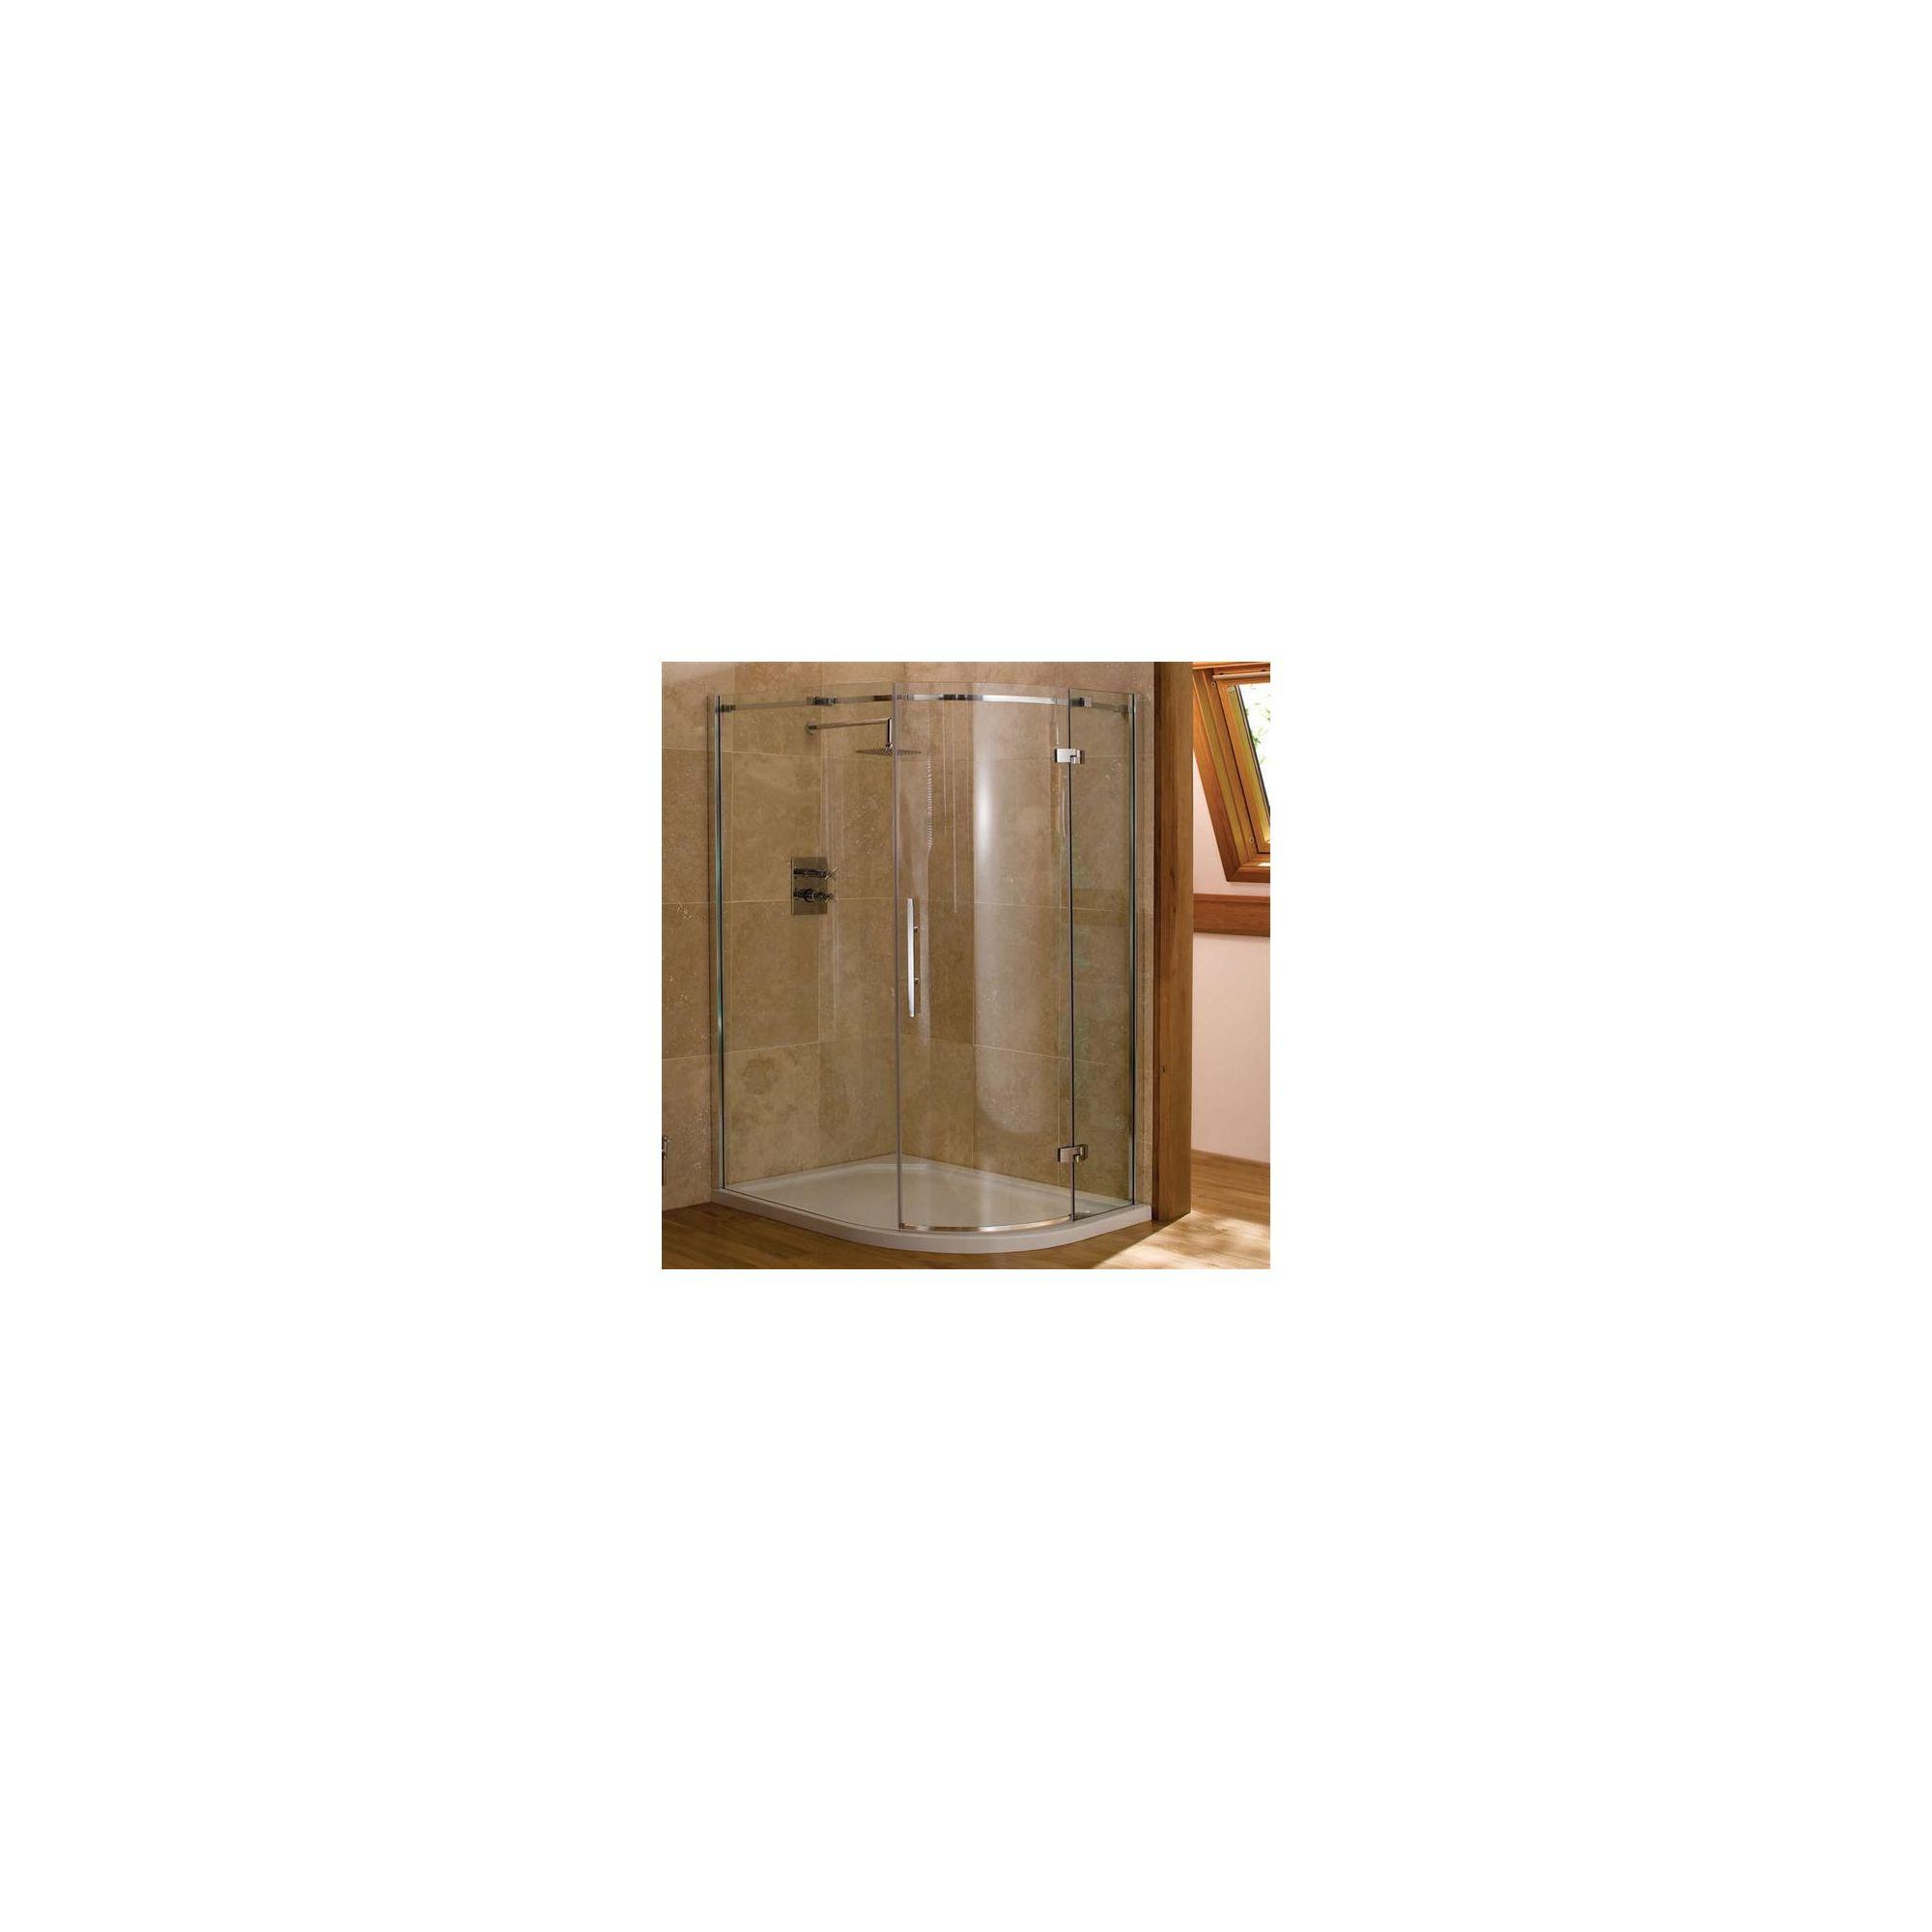 Merlyn Vivid Nine Offset Quadrant Shower Door, 1200mm x 800mm, Left Handed, 8mm Glass at Tesco Direct